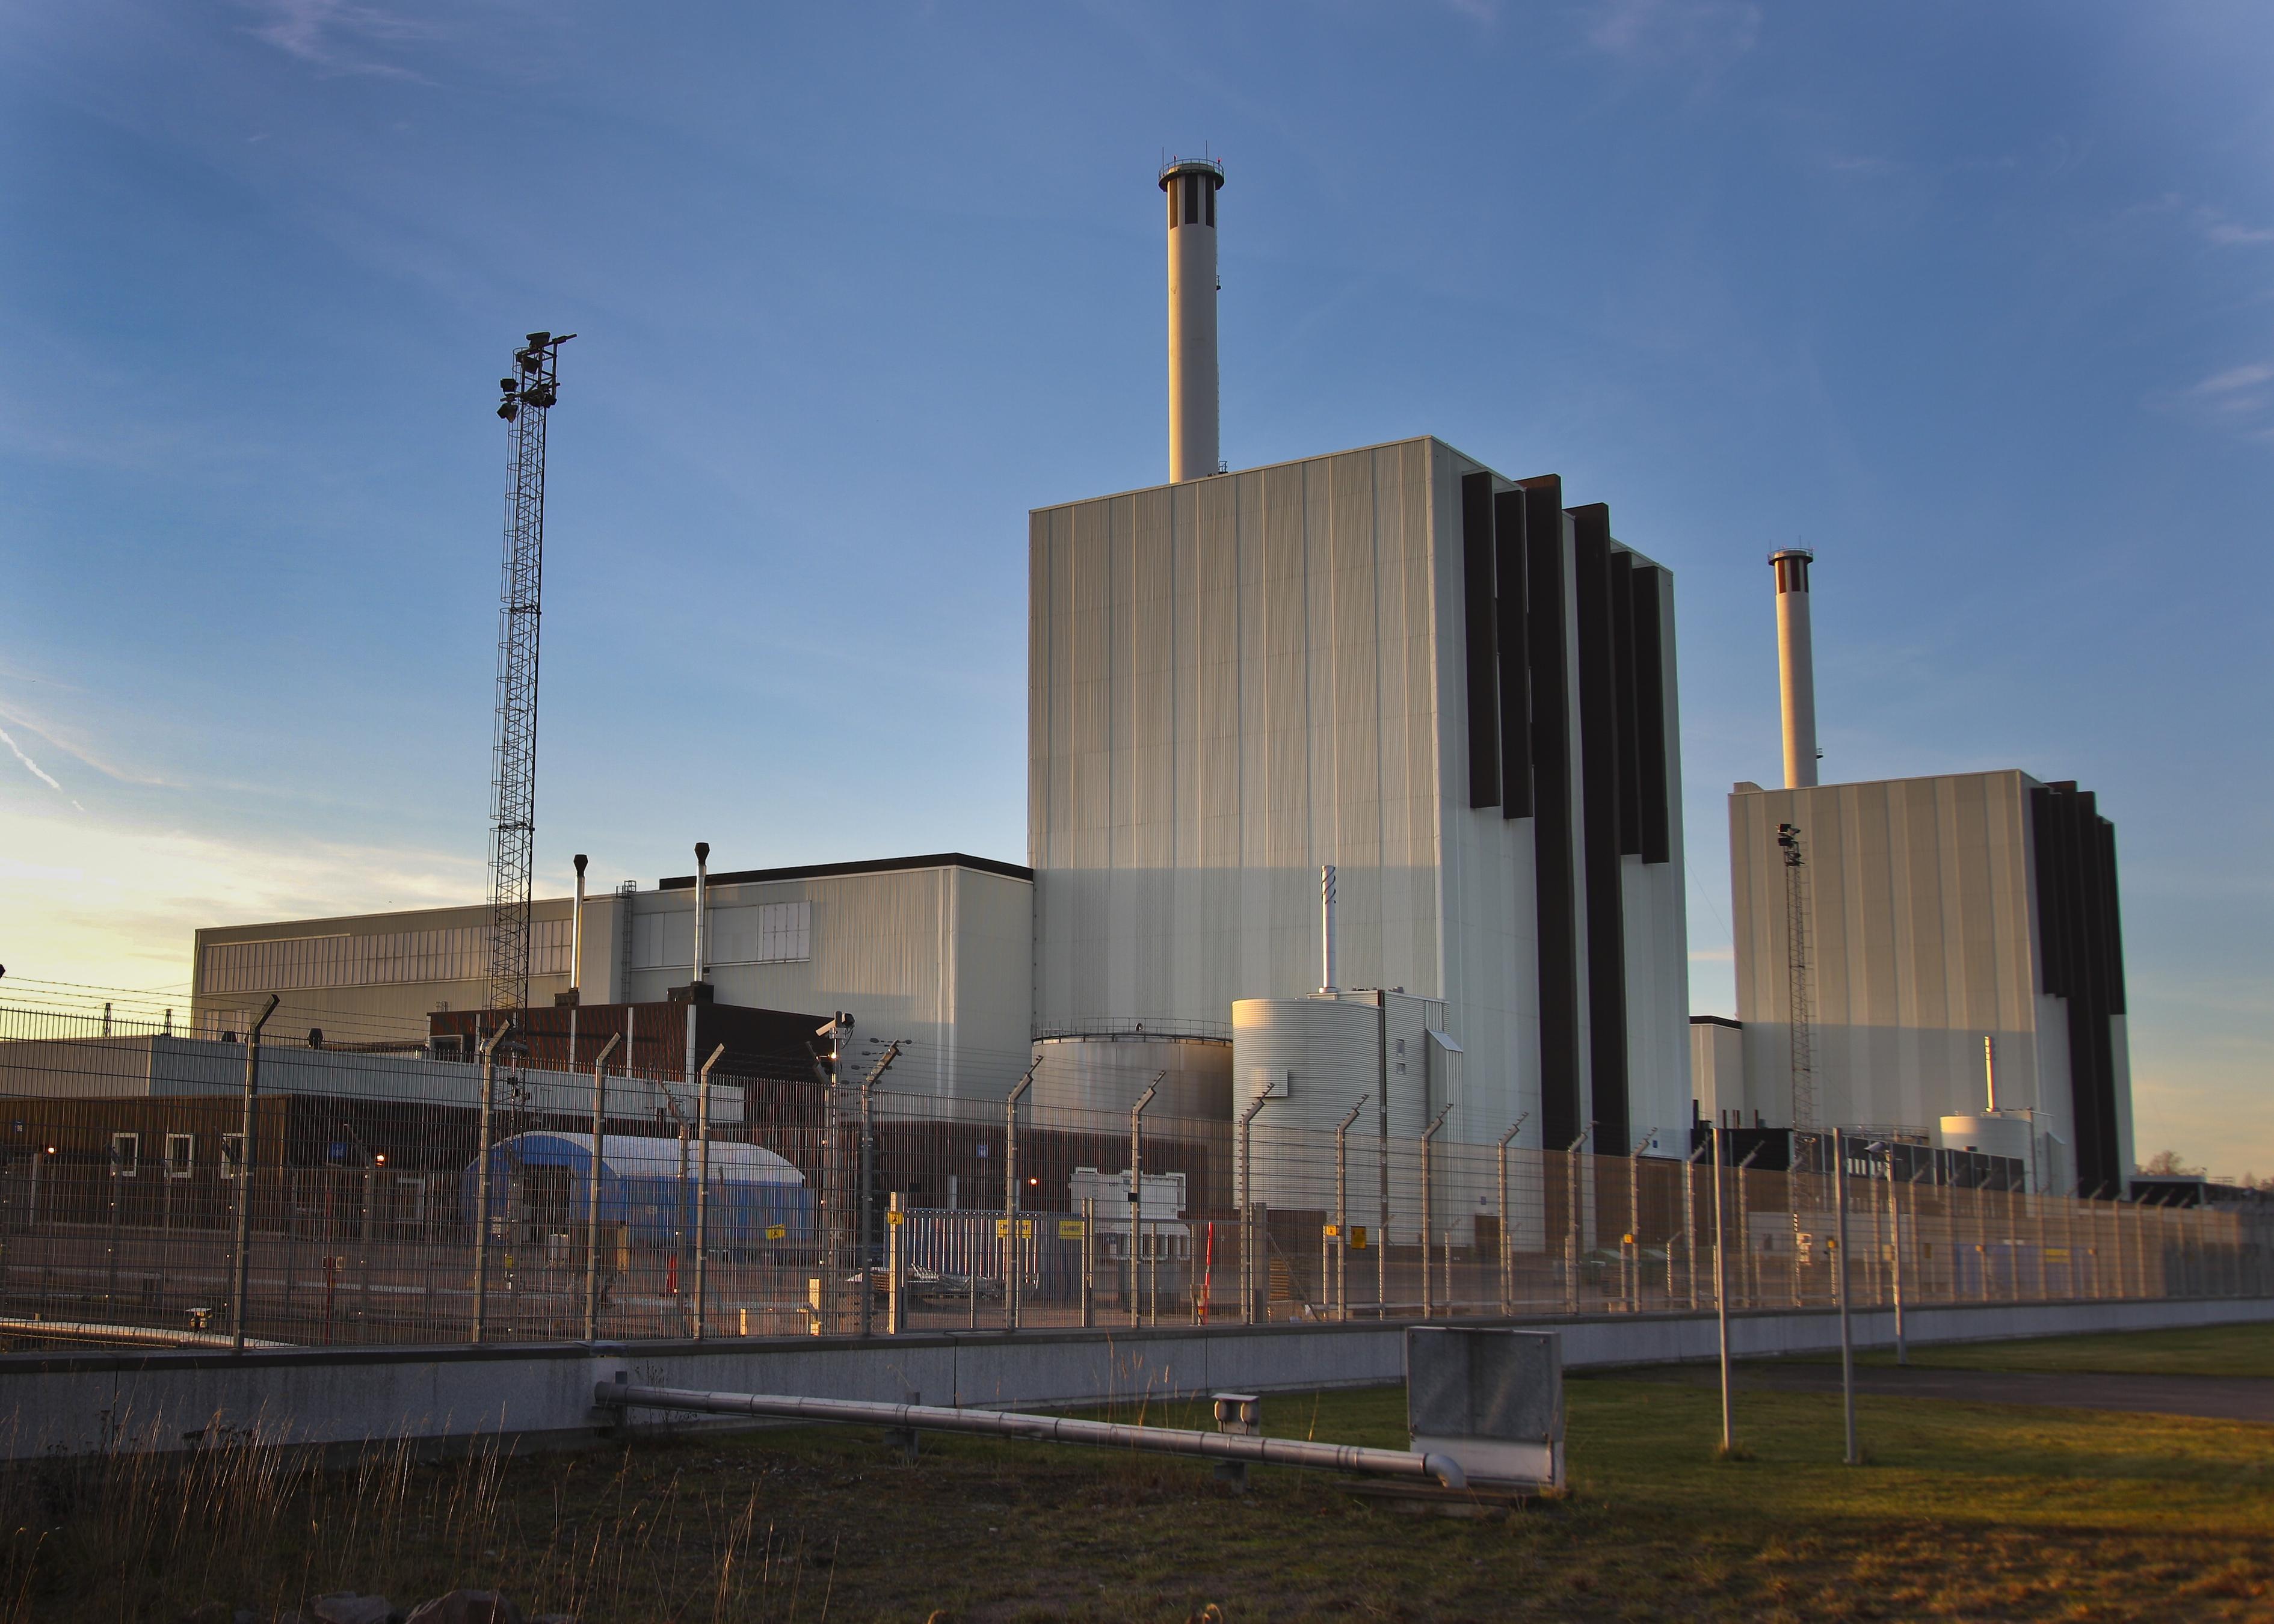 Forsmark nuclear plant exterior 02